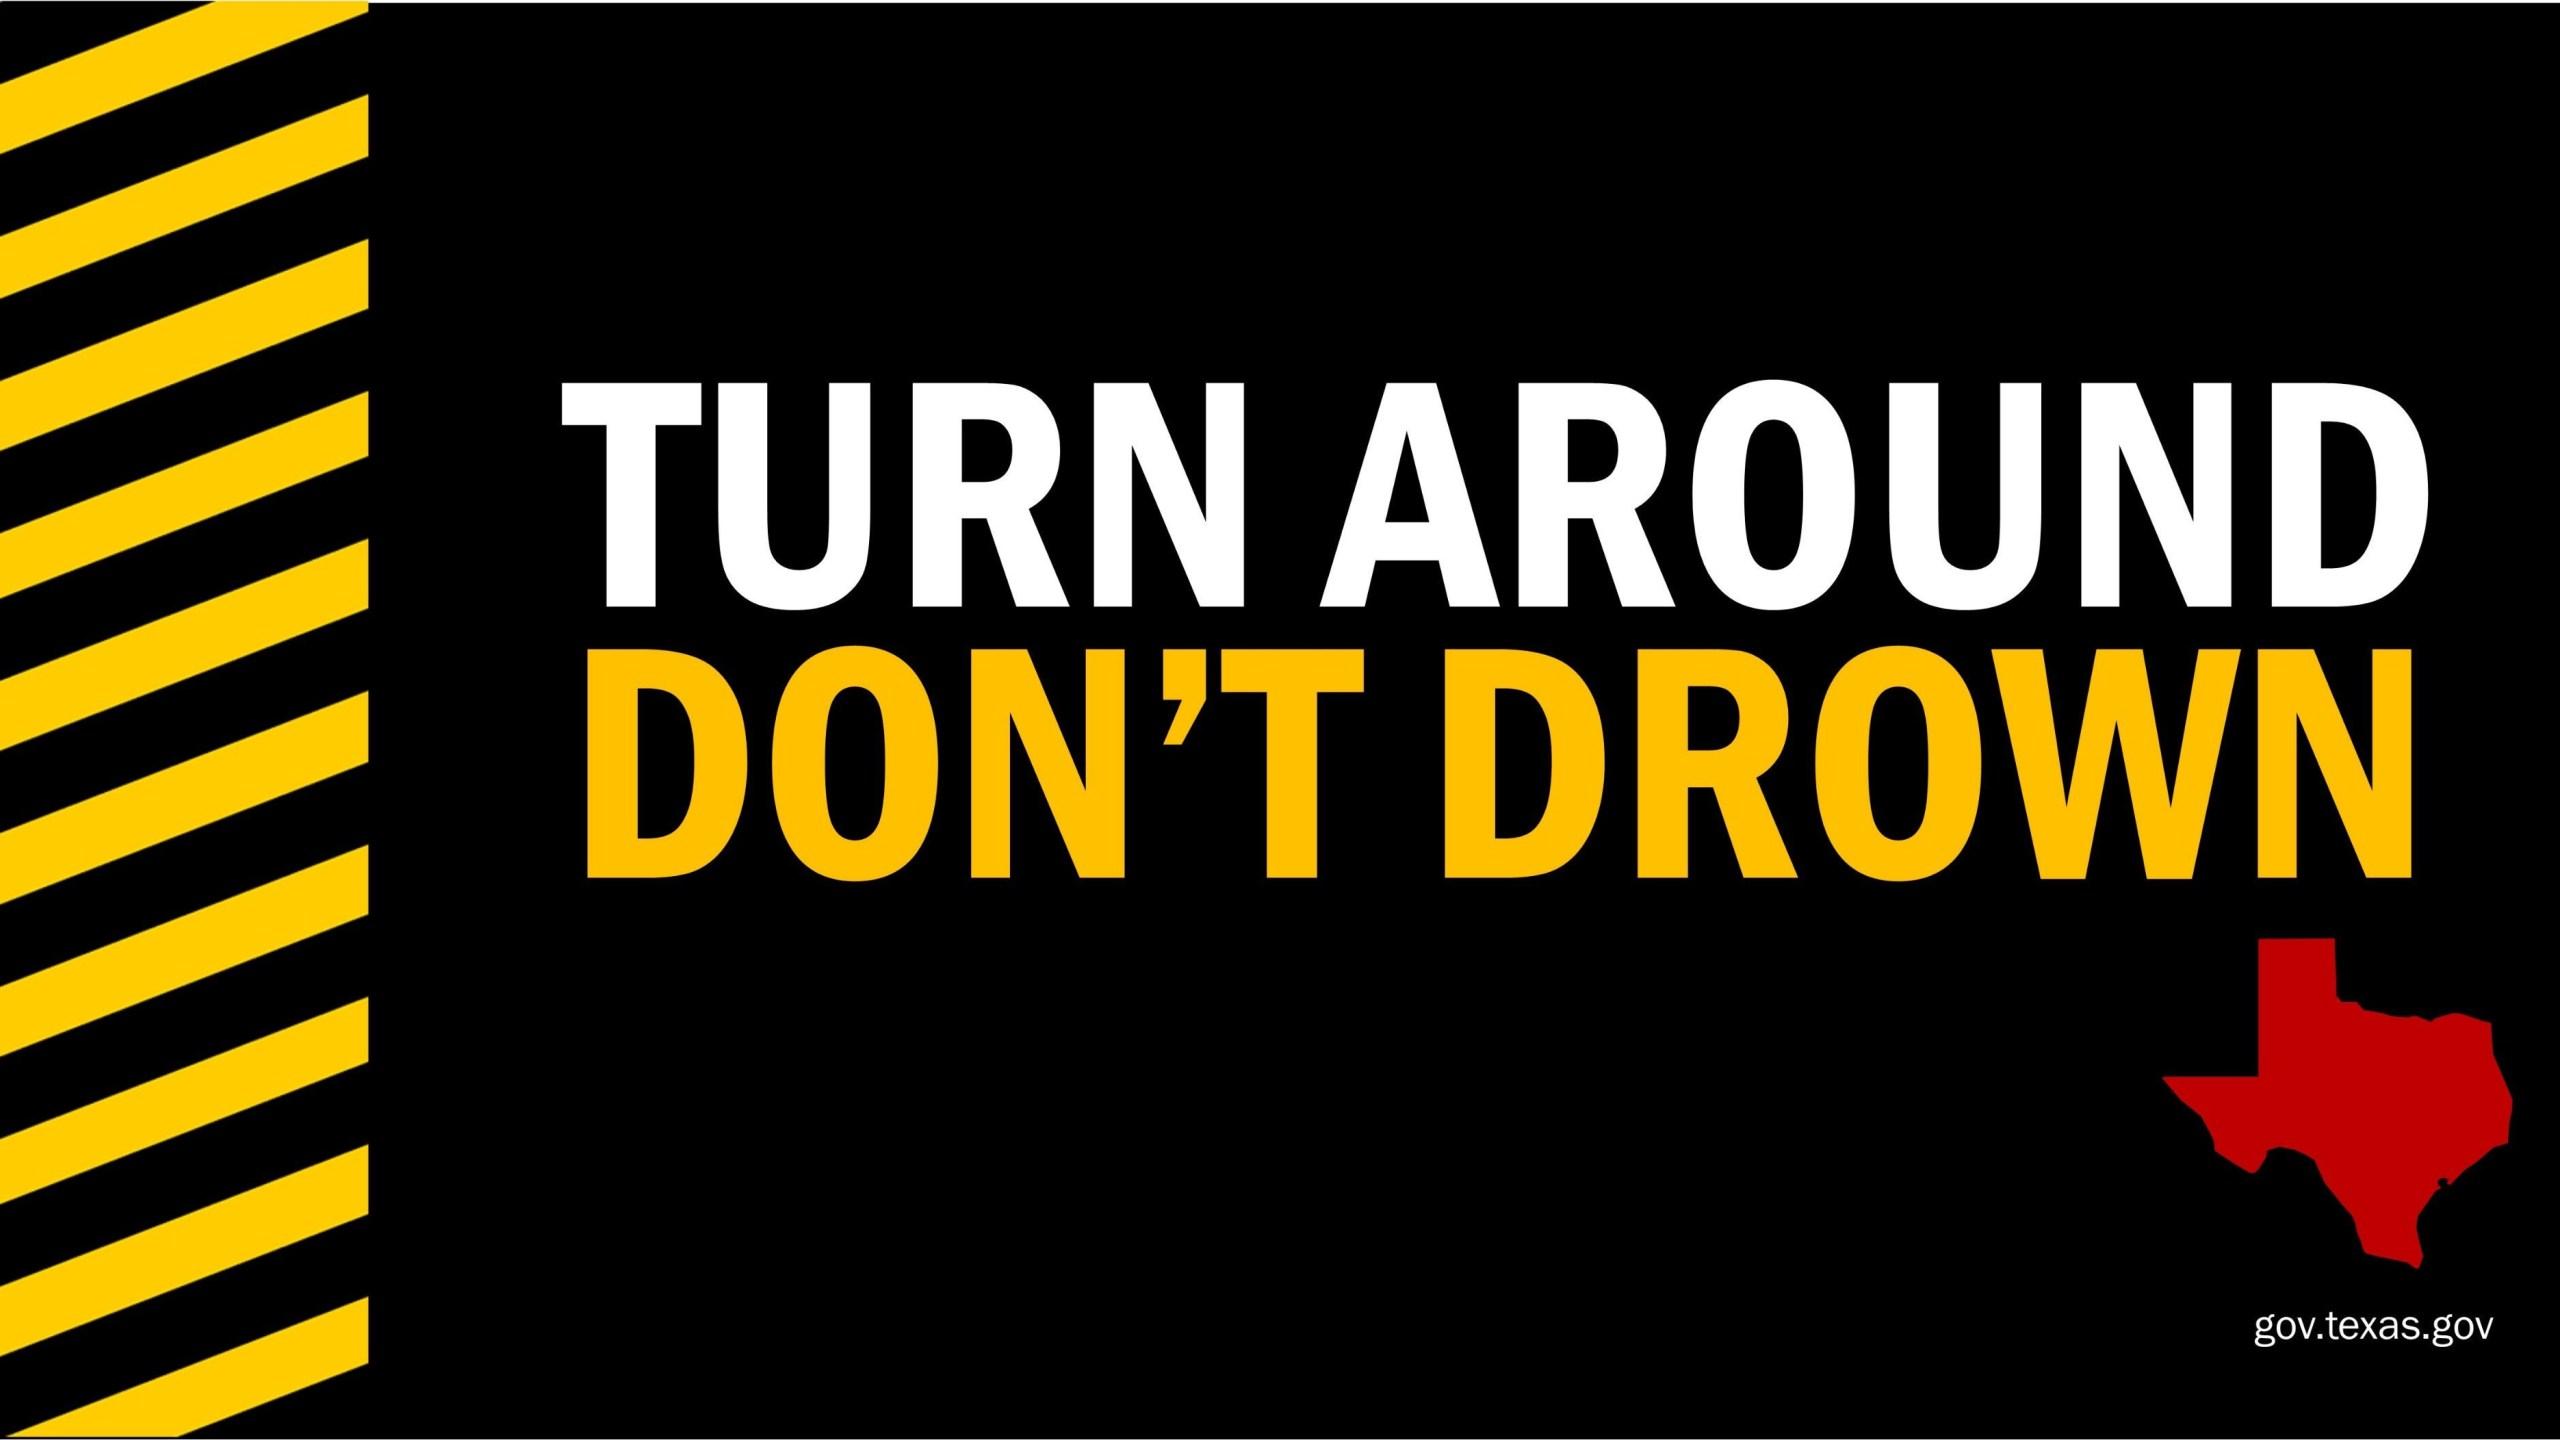 turn around don't drown_1558274719124.png.jpg